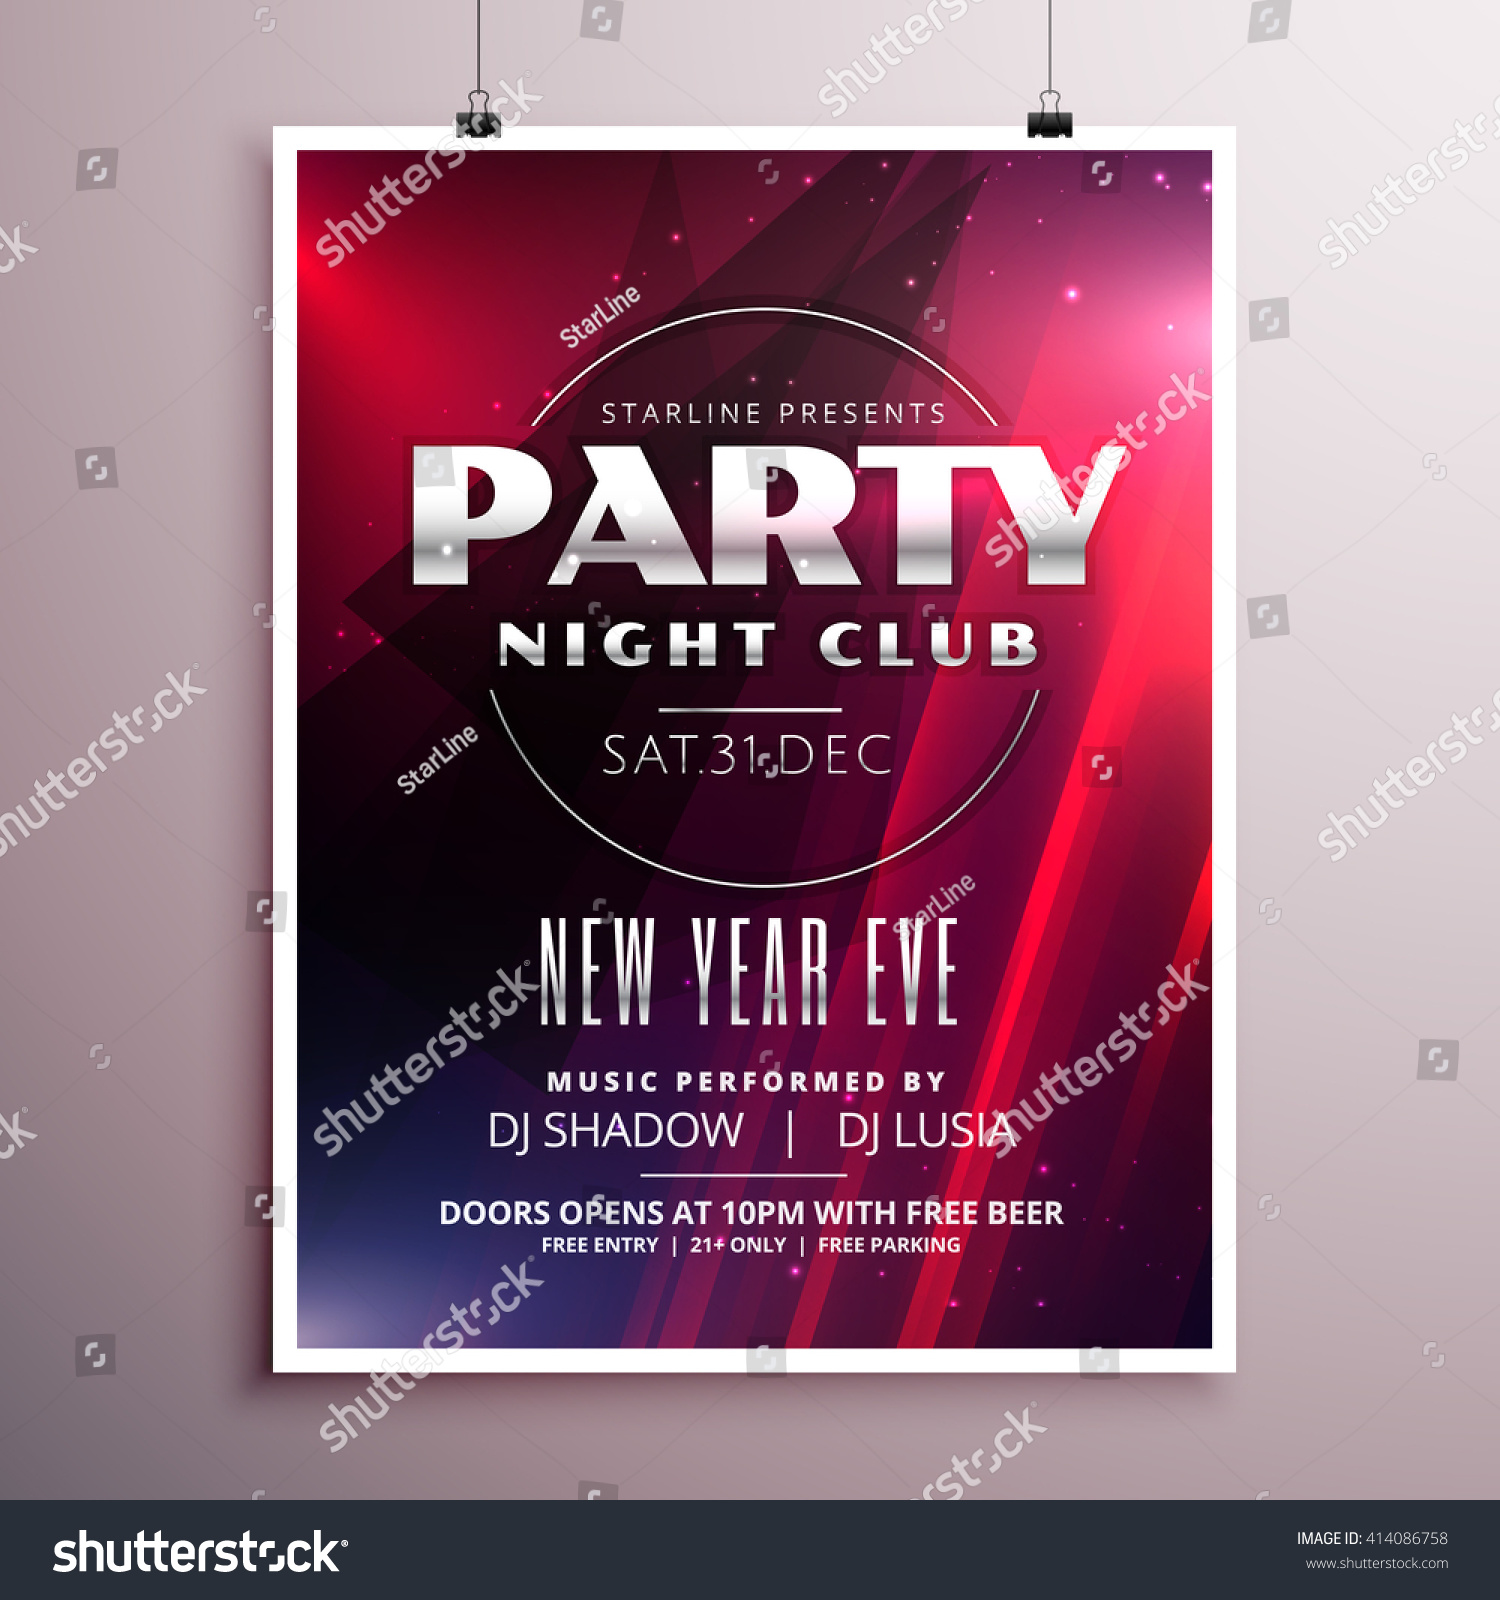 nightclub party flyer template design event stock vector  nightclub party flyer template design event details